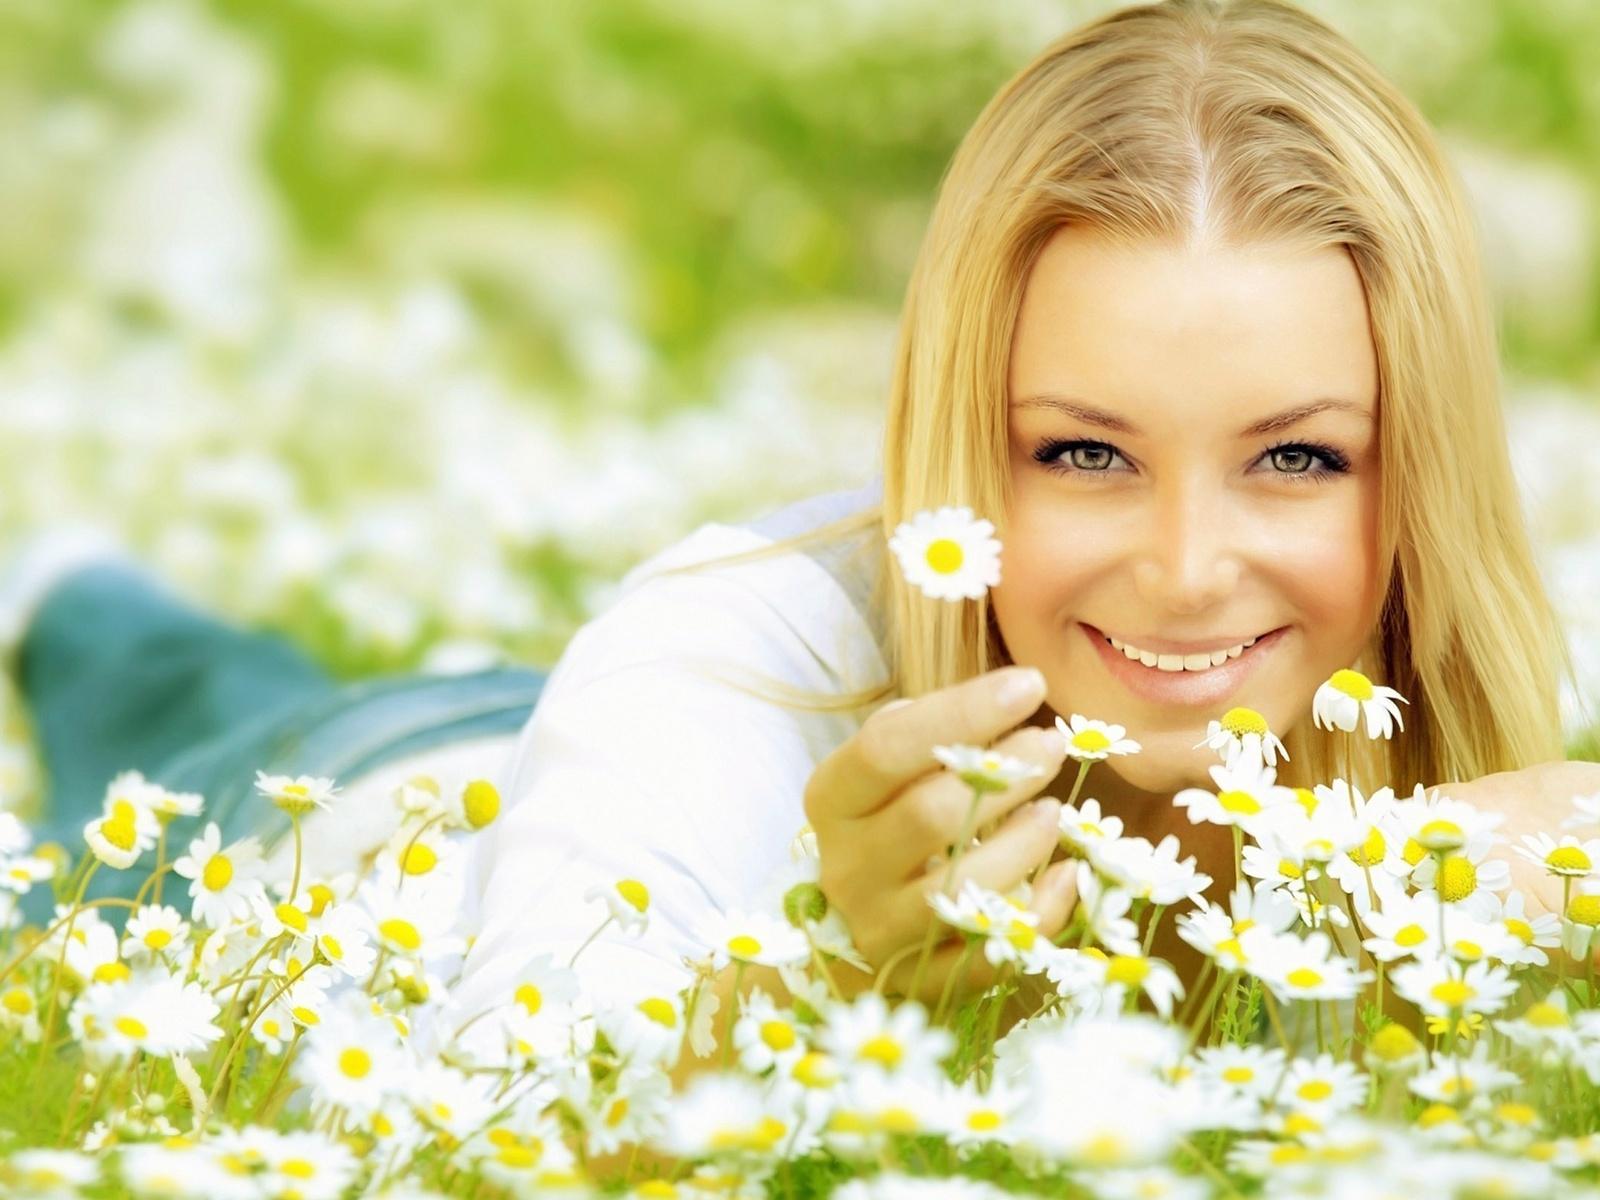 Smiling blonde girl lying on daisy flowers hd wallpaper